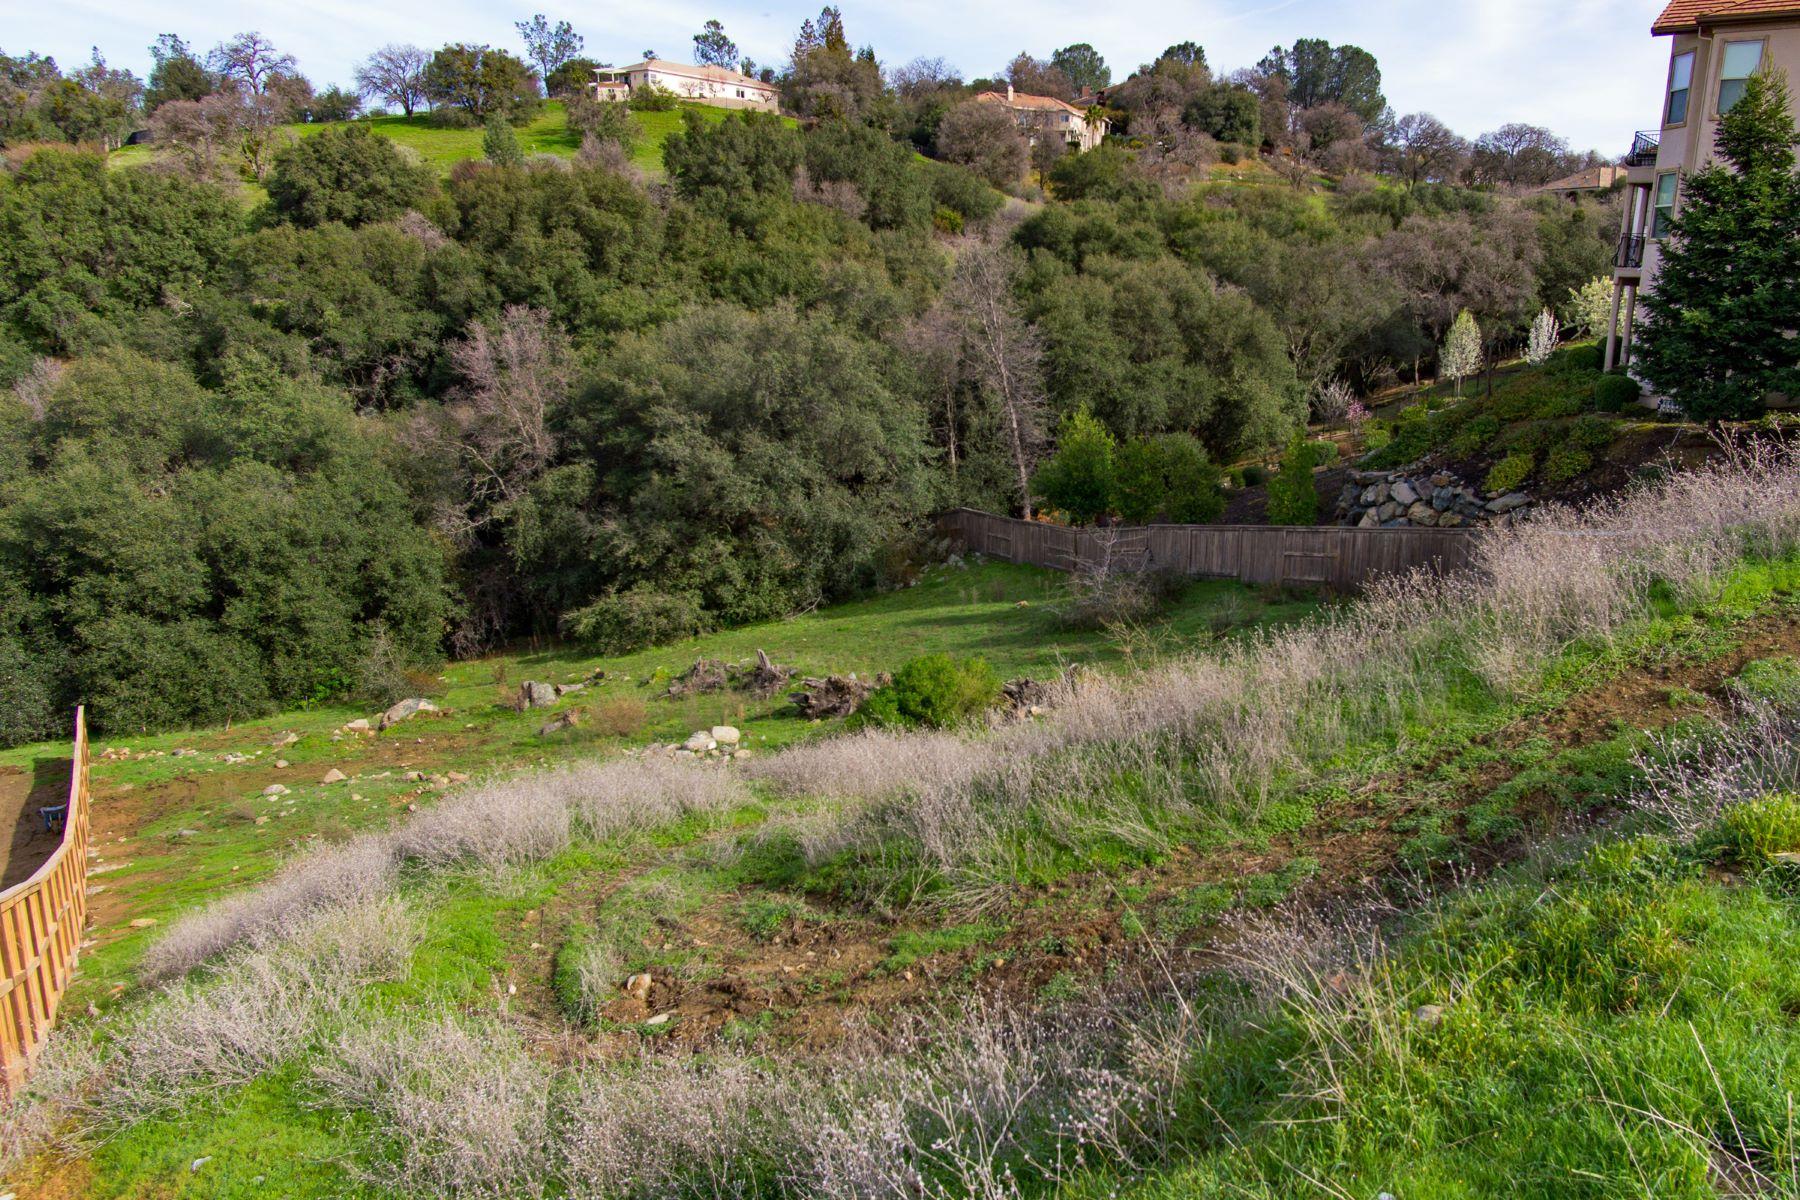 Land for Sale at Breathtaking Lake Views 3141 Corsica Drive El Dorado Hills, California 95762 United States